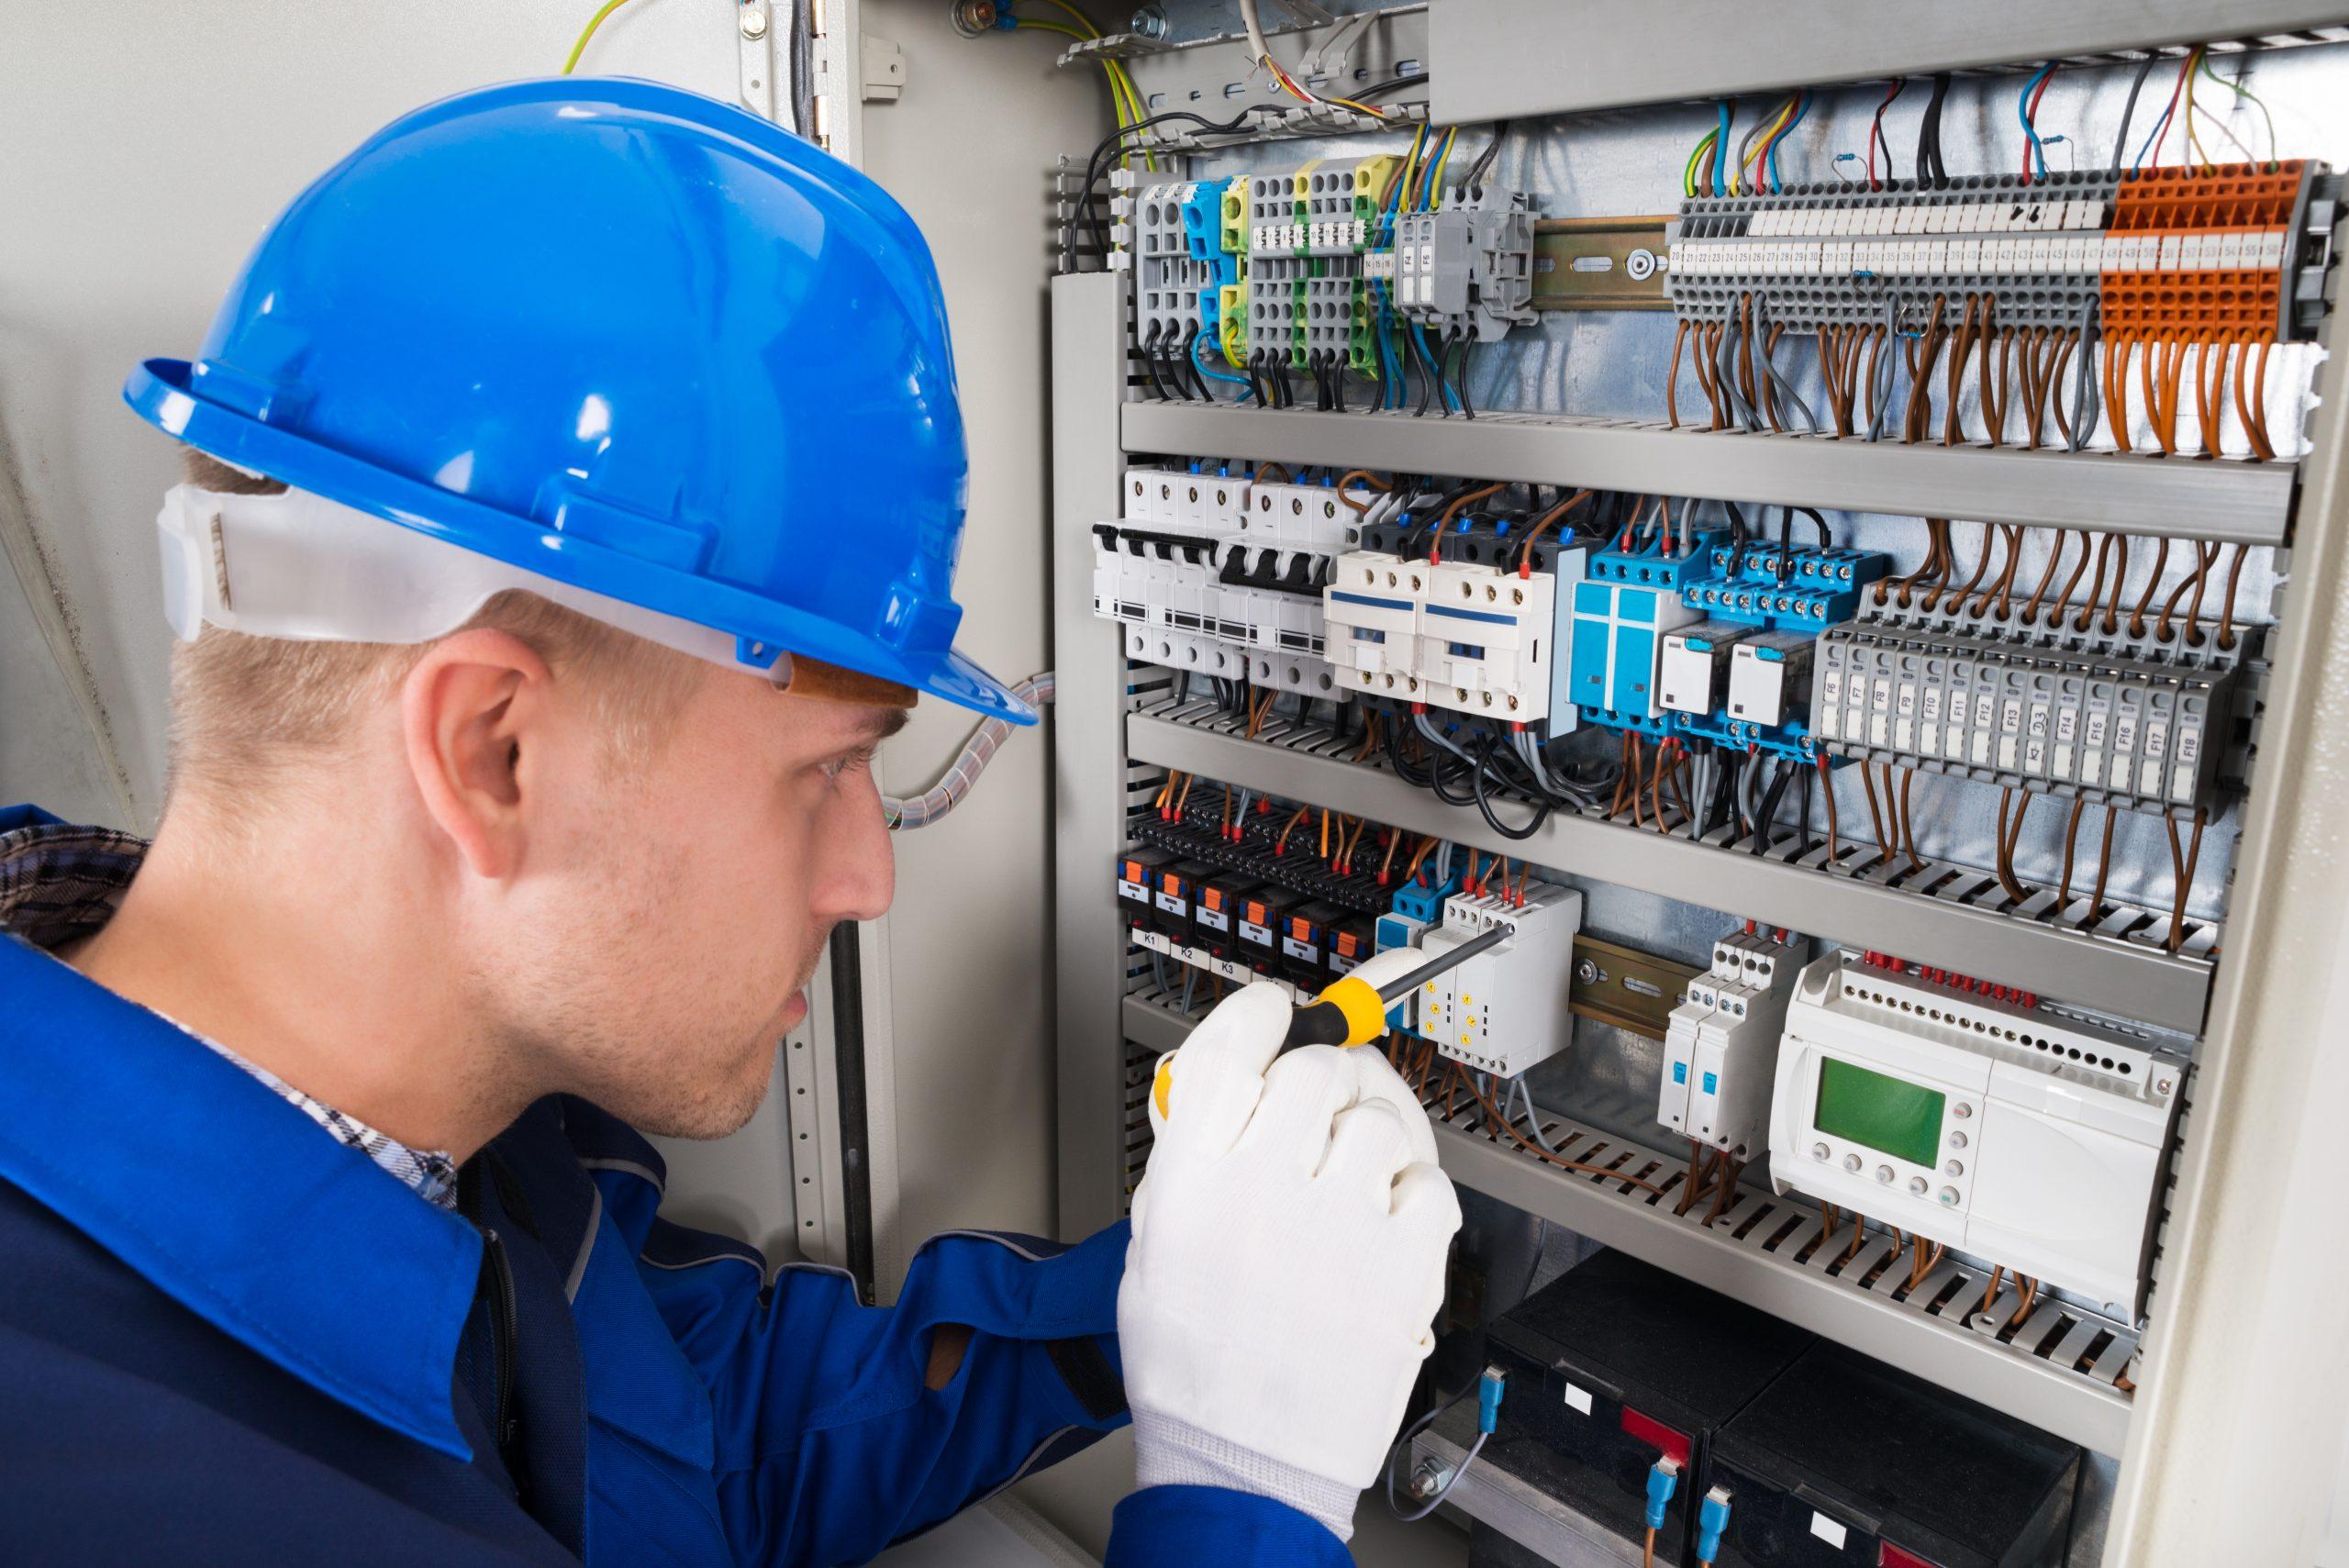 Elektriker aus Bulgarien